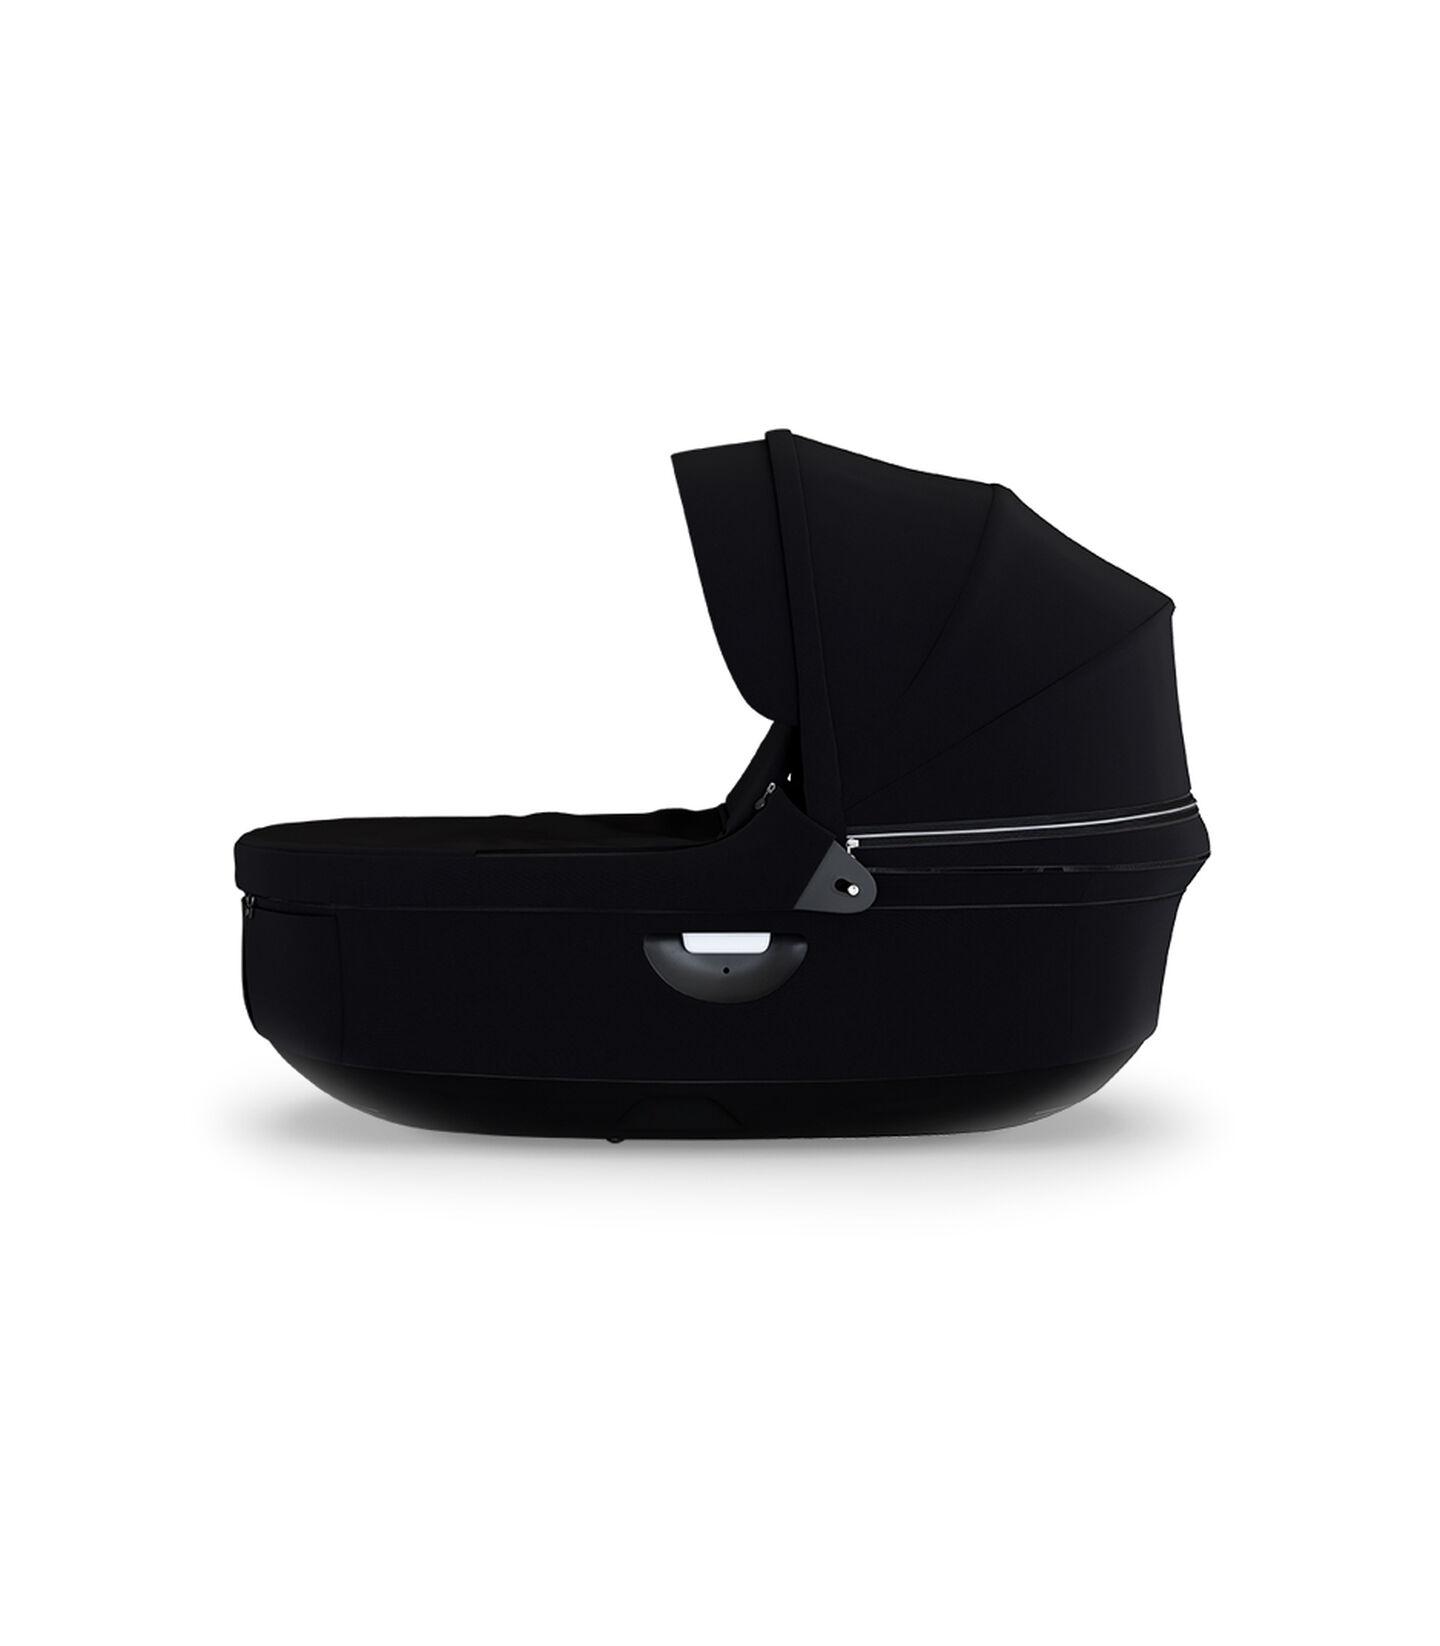 Stokke® Stroller Black Carry Cot Black, Black, mainview